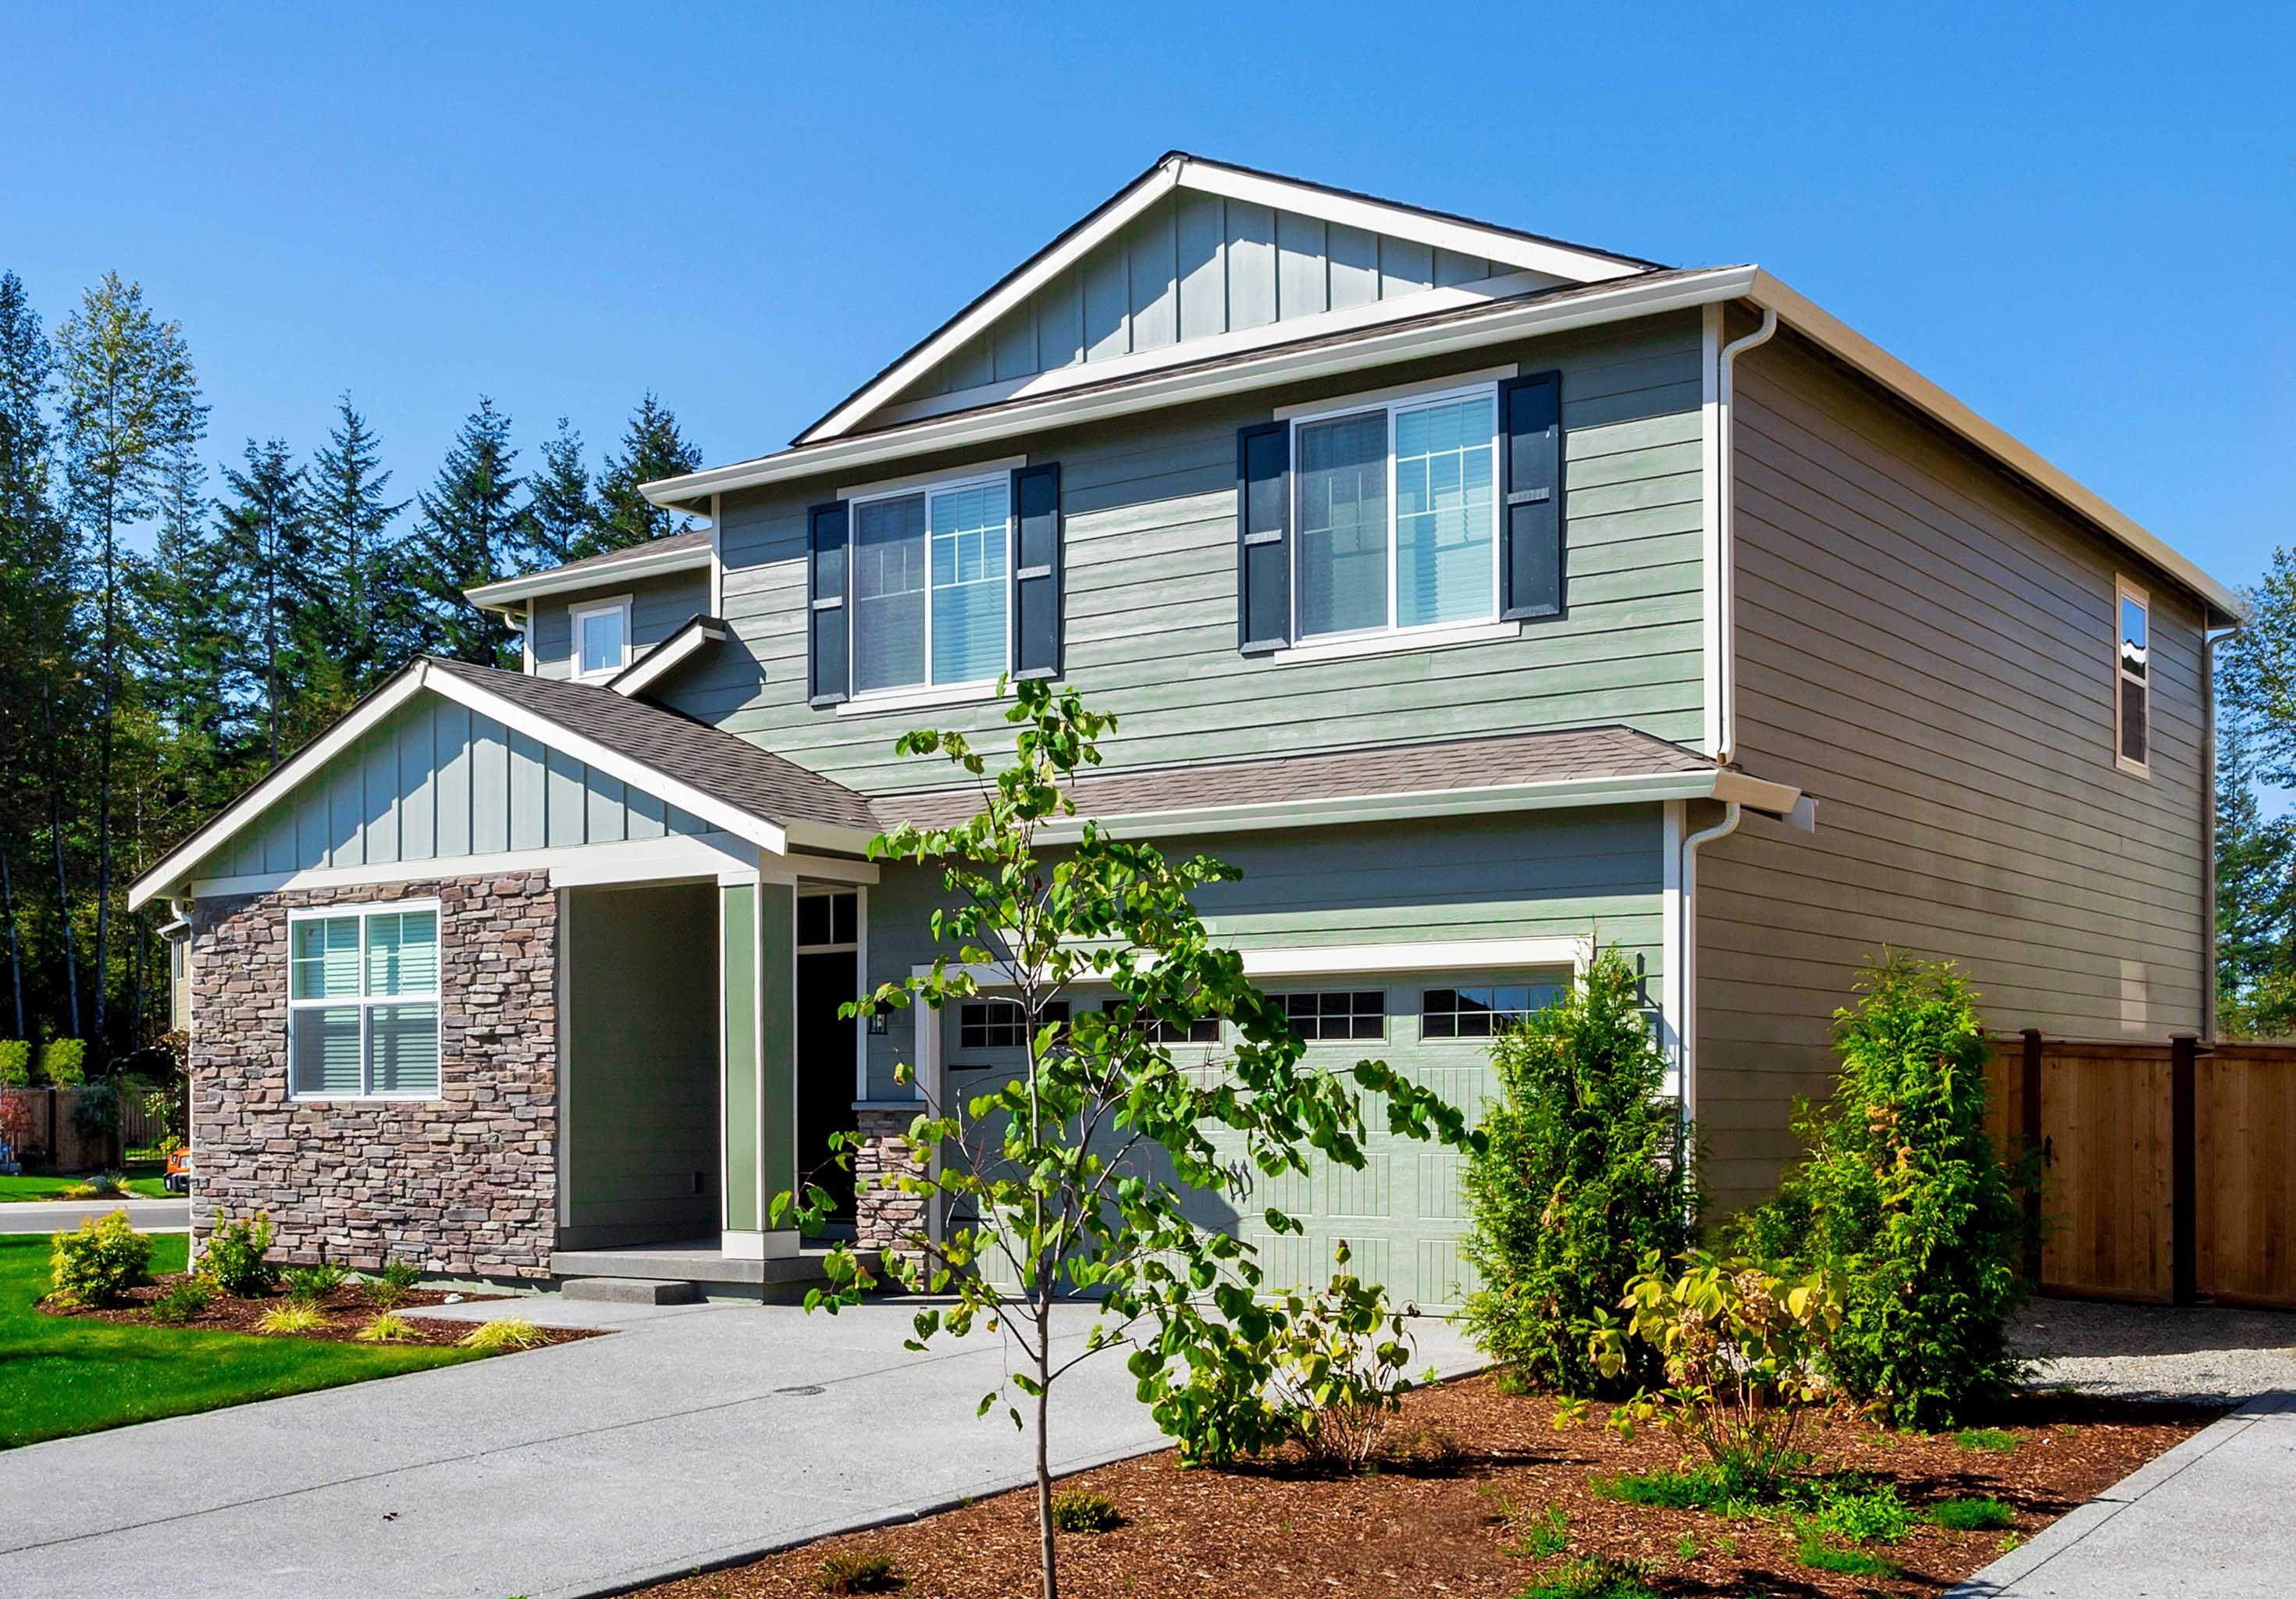 New Homes for Sale Steilacoom Washington